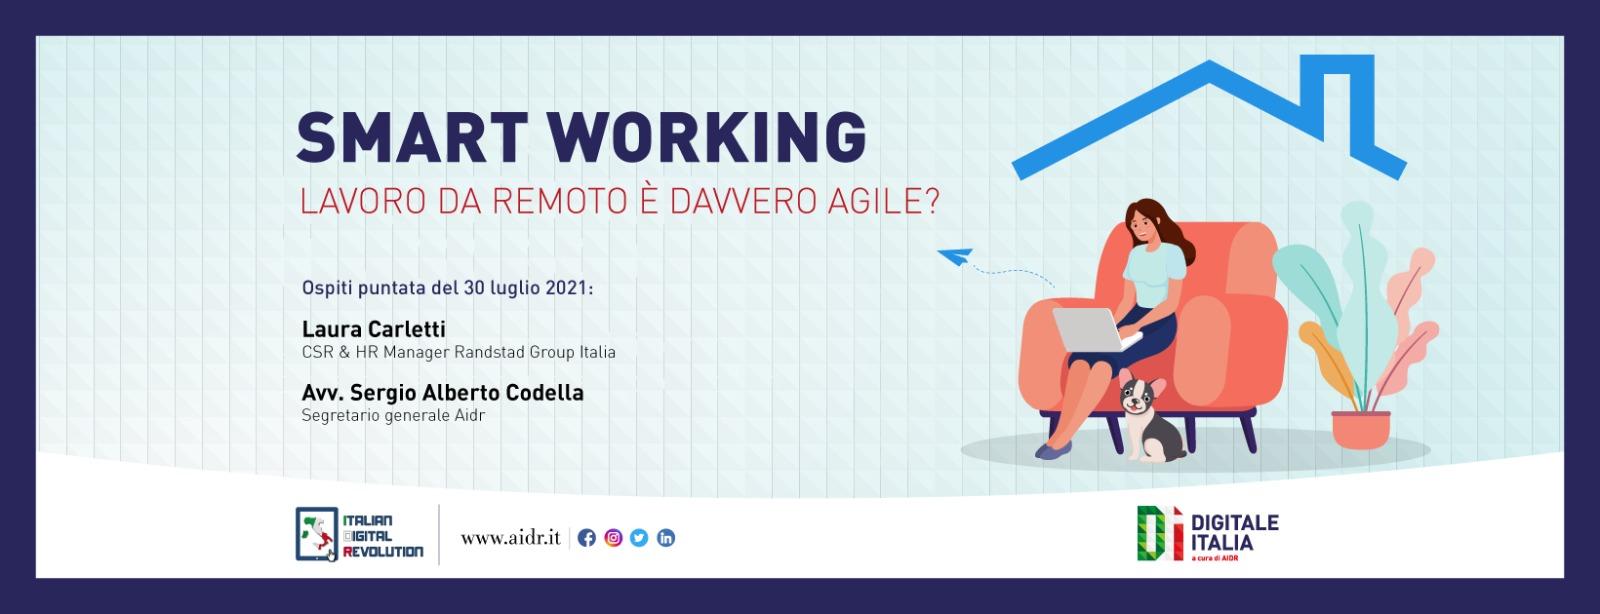 Lo smart working post pandemia, approfondimento a Digitale Italia.